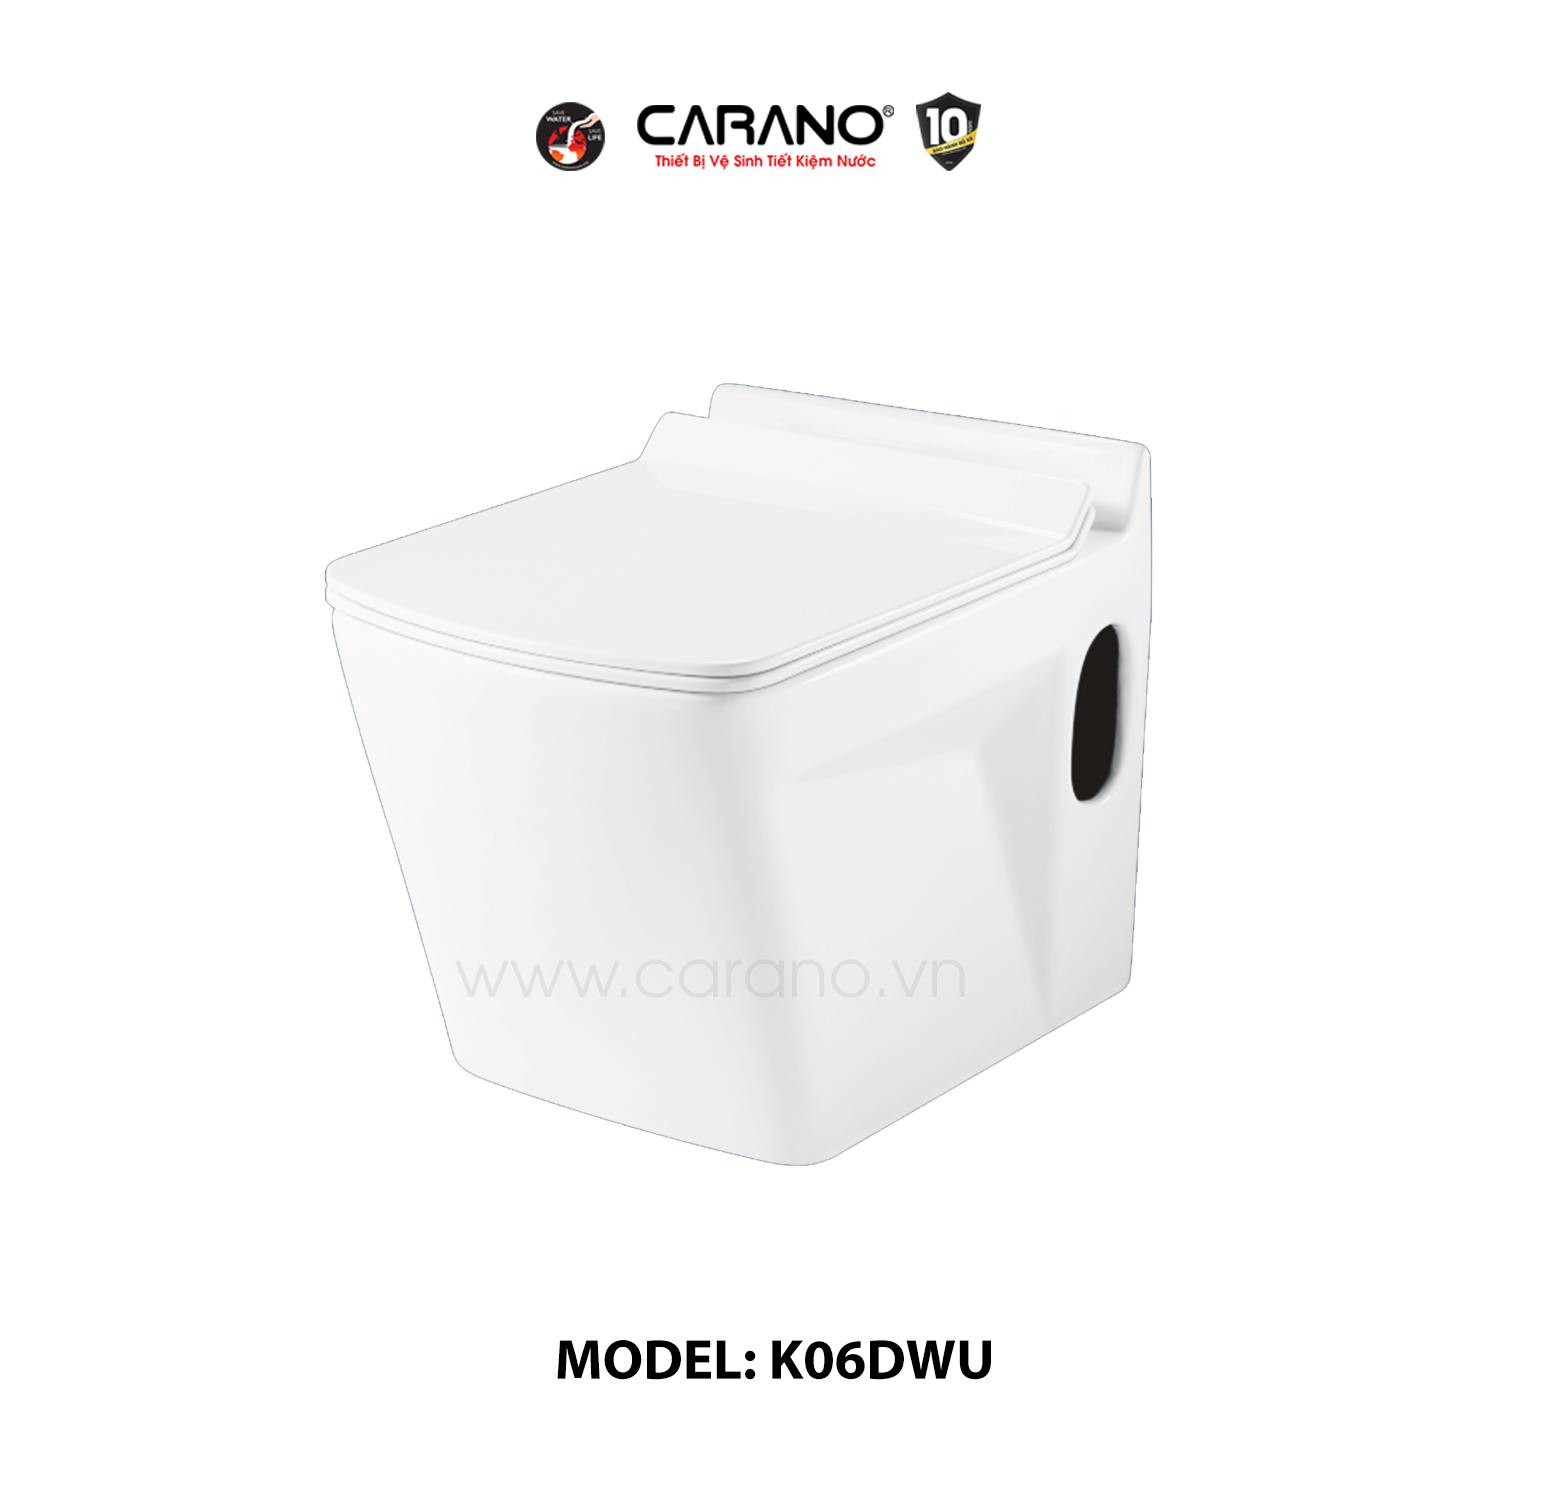 TOILET CARANO MODEL K06DWU